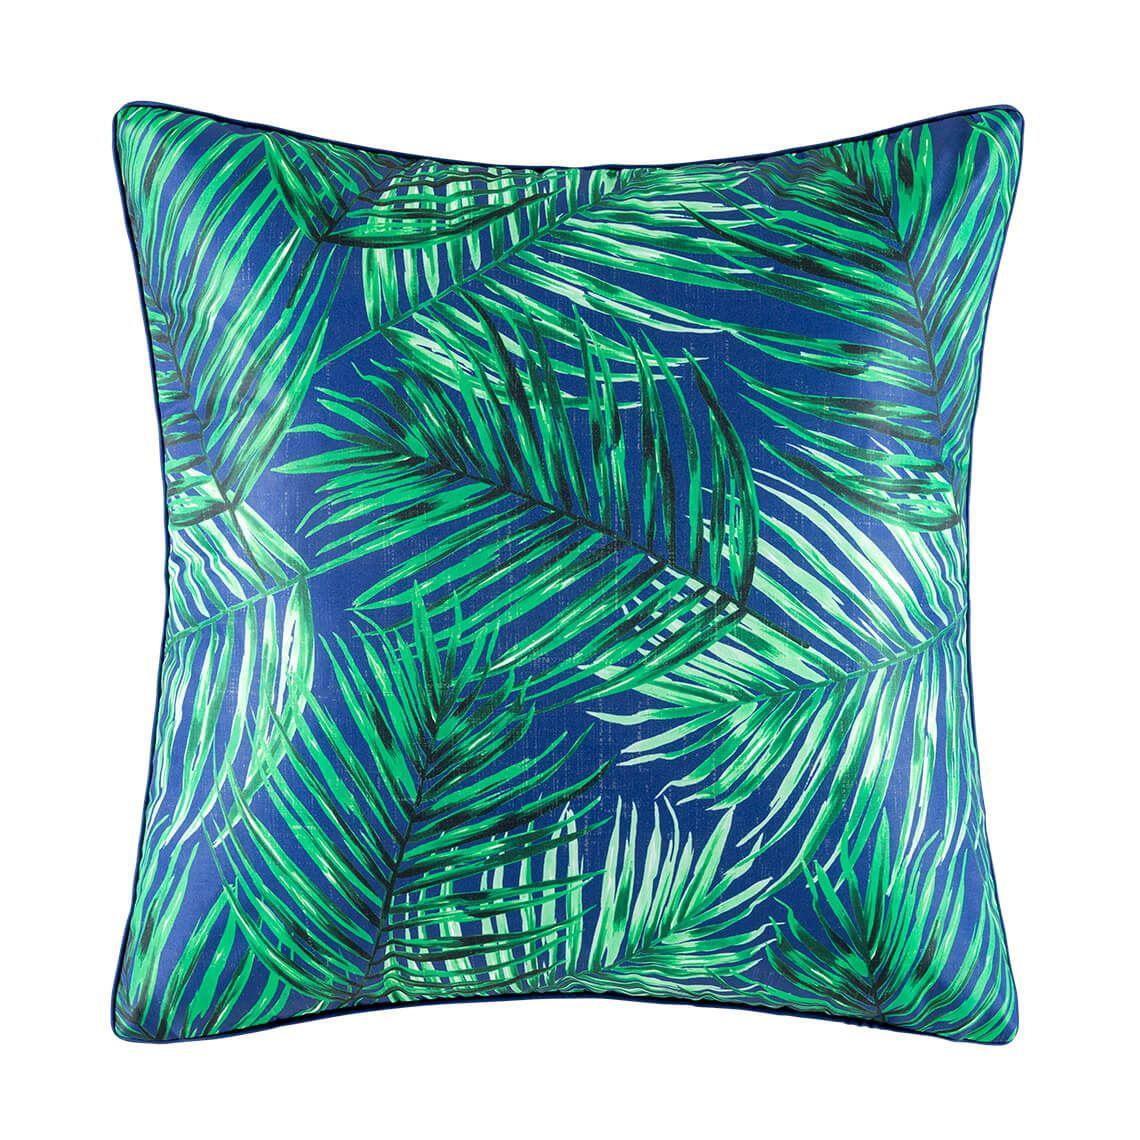 Scopello Floor Cushion Size W 70cm x D 20cm x H 70cm Freedom